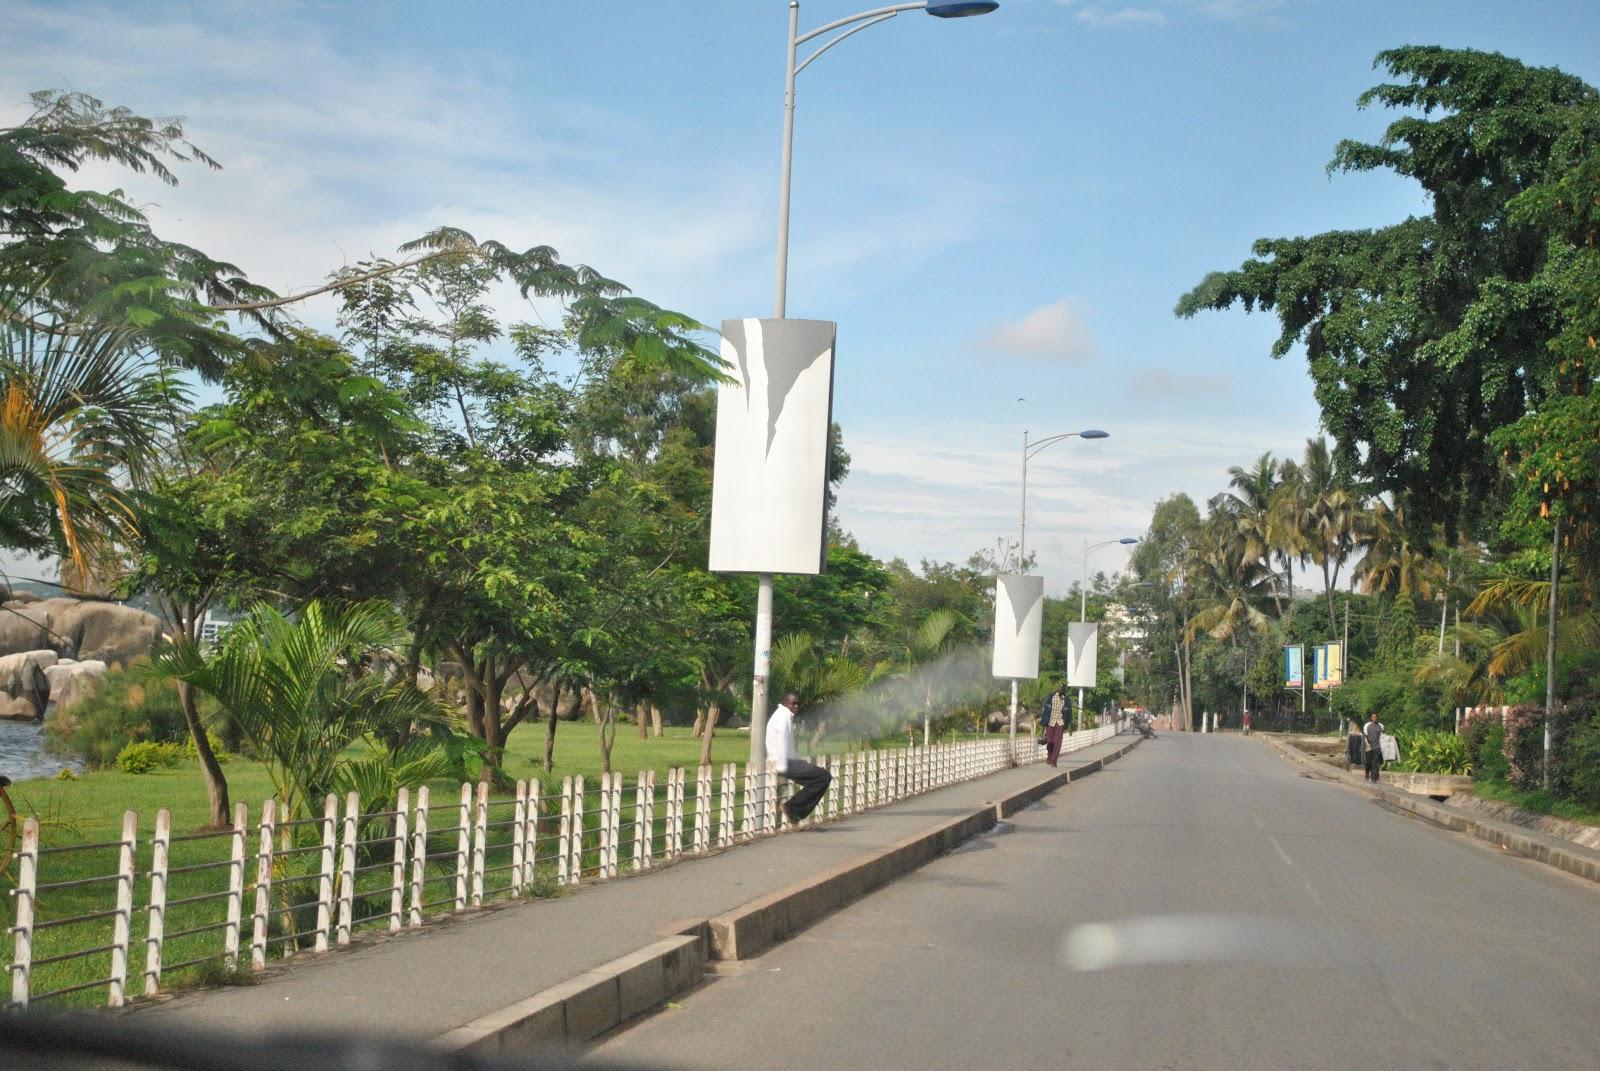 Mwanza Rock City Tembea Tanzania